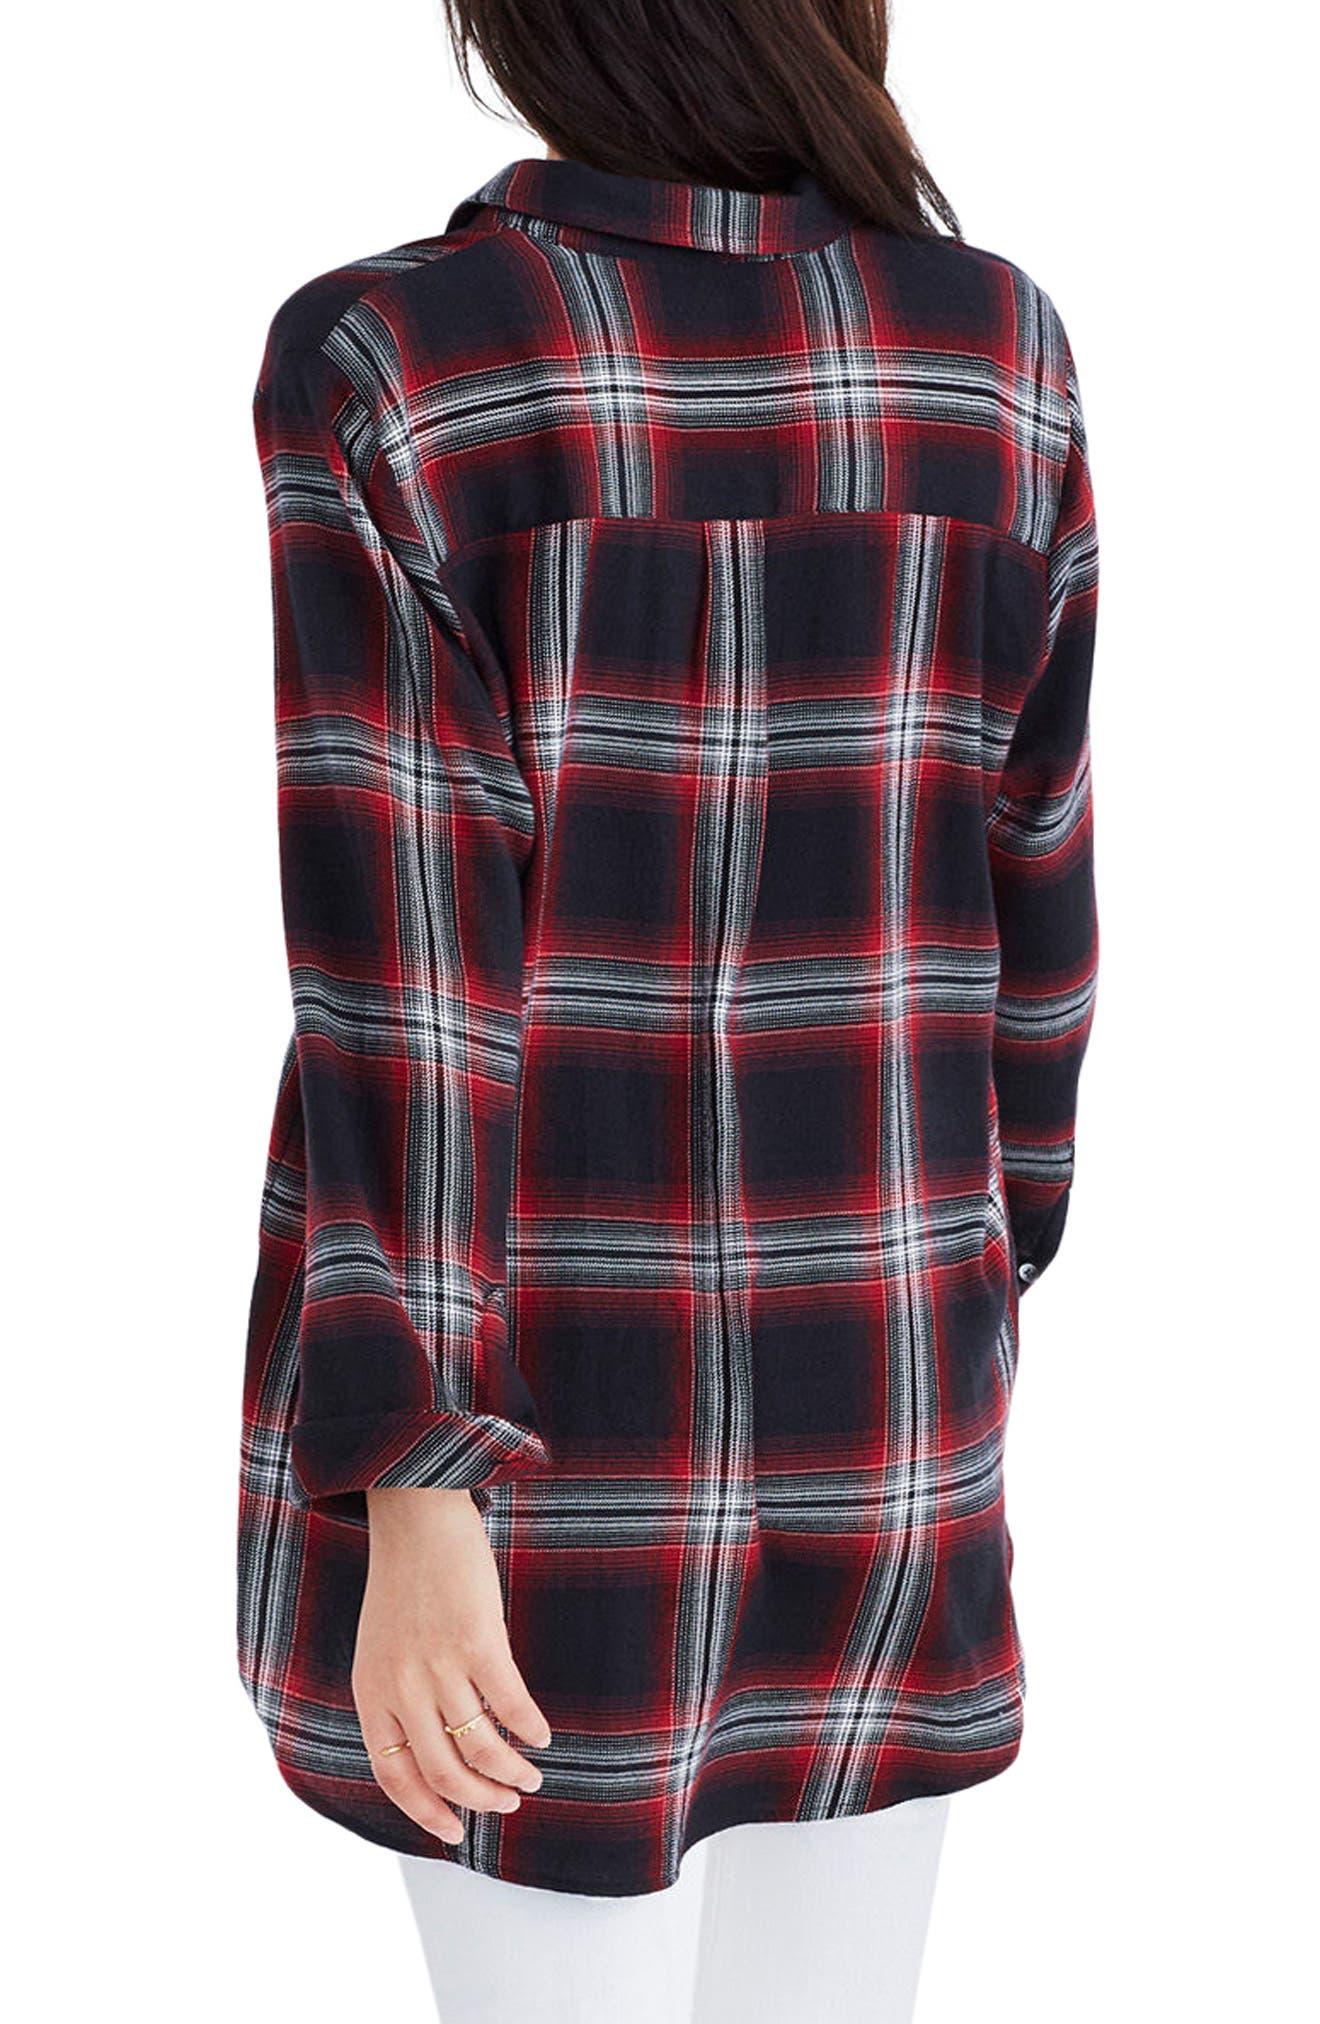 MADEWELL,                             Classic Ex-Boyfriend Shirt,                             Alternate thumbnail 2, color,                             009